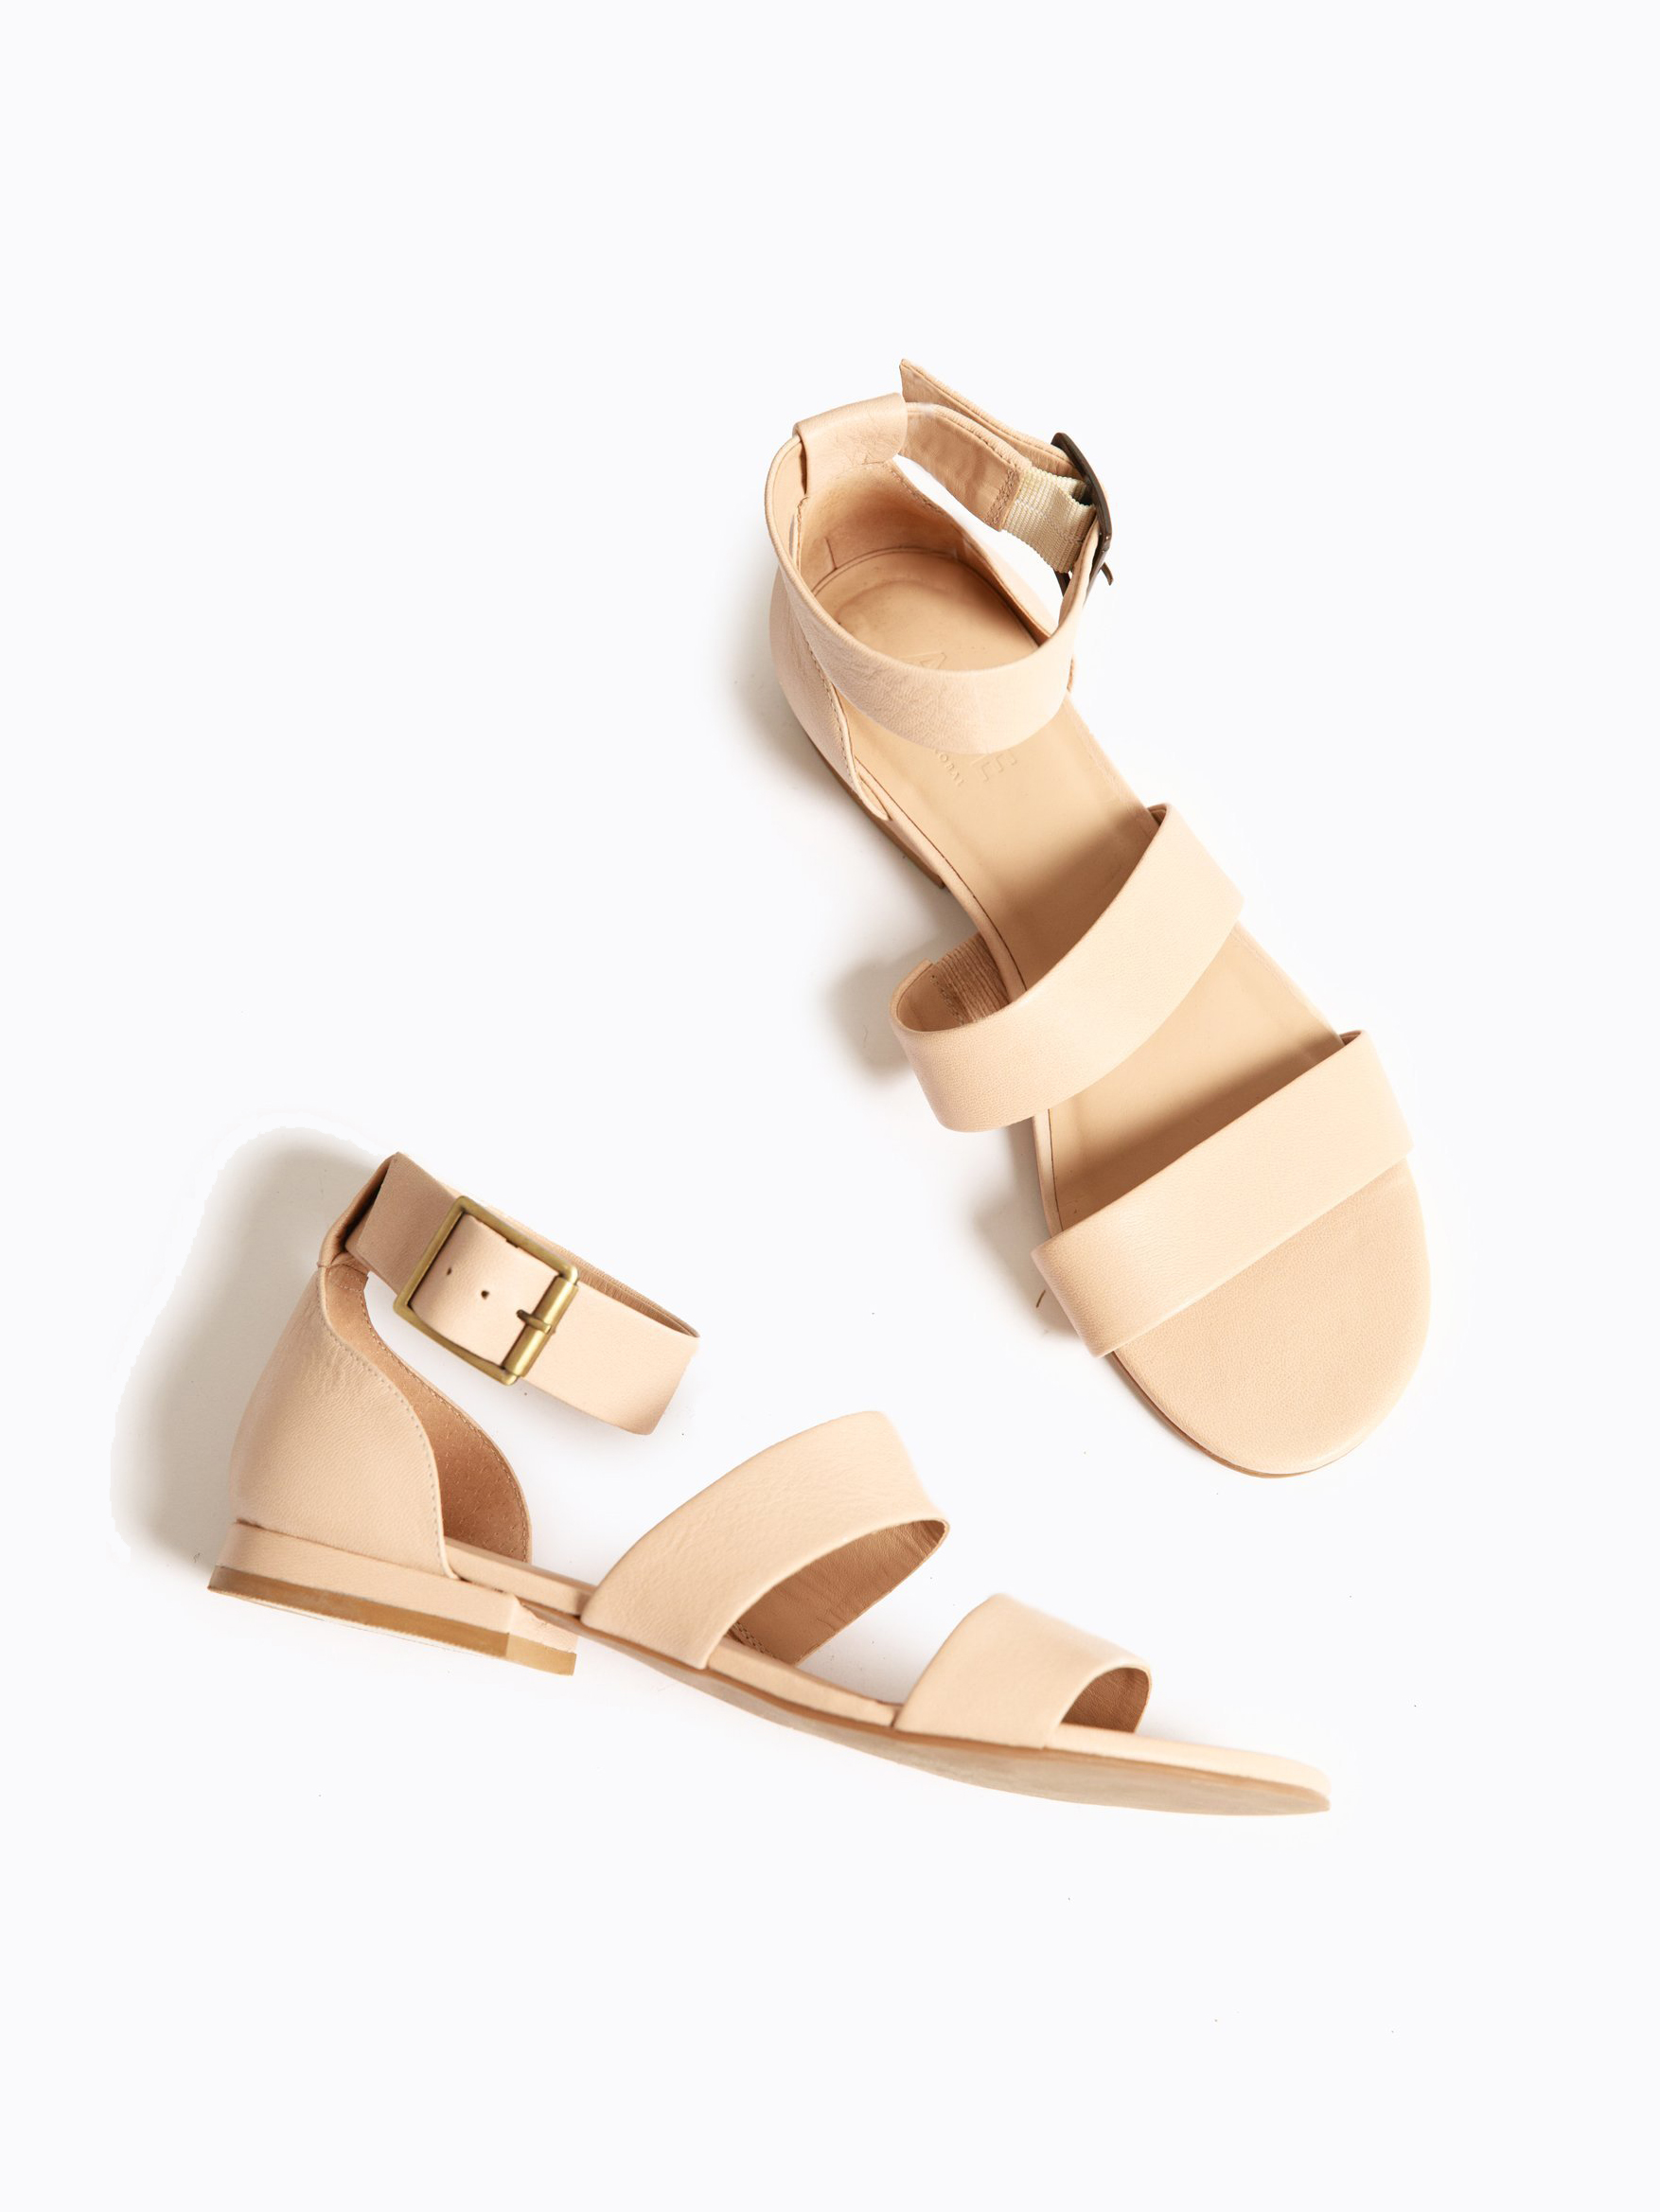 10 Fair Trade \u0026 Eco-Friendly Sandals We